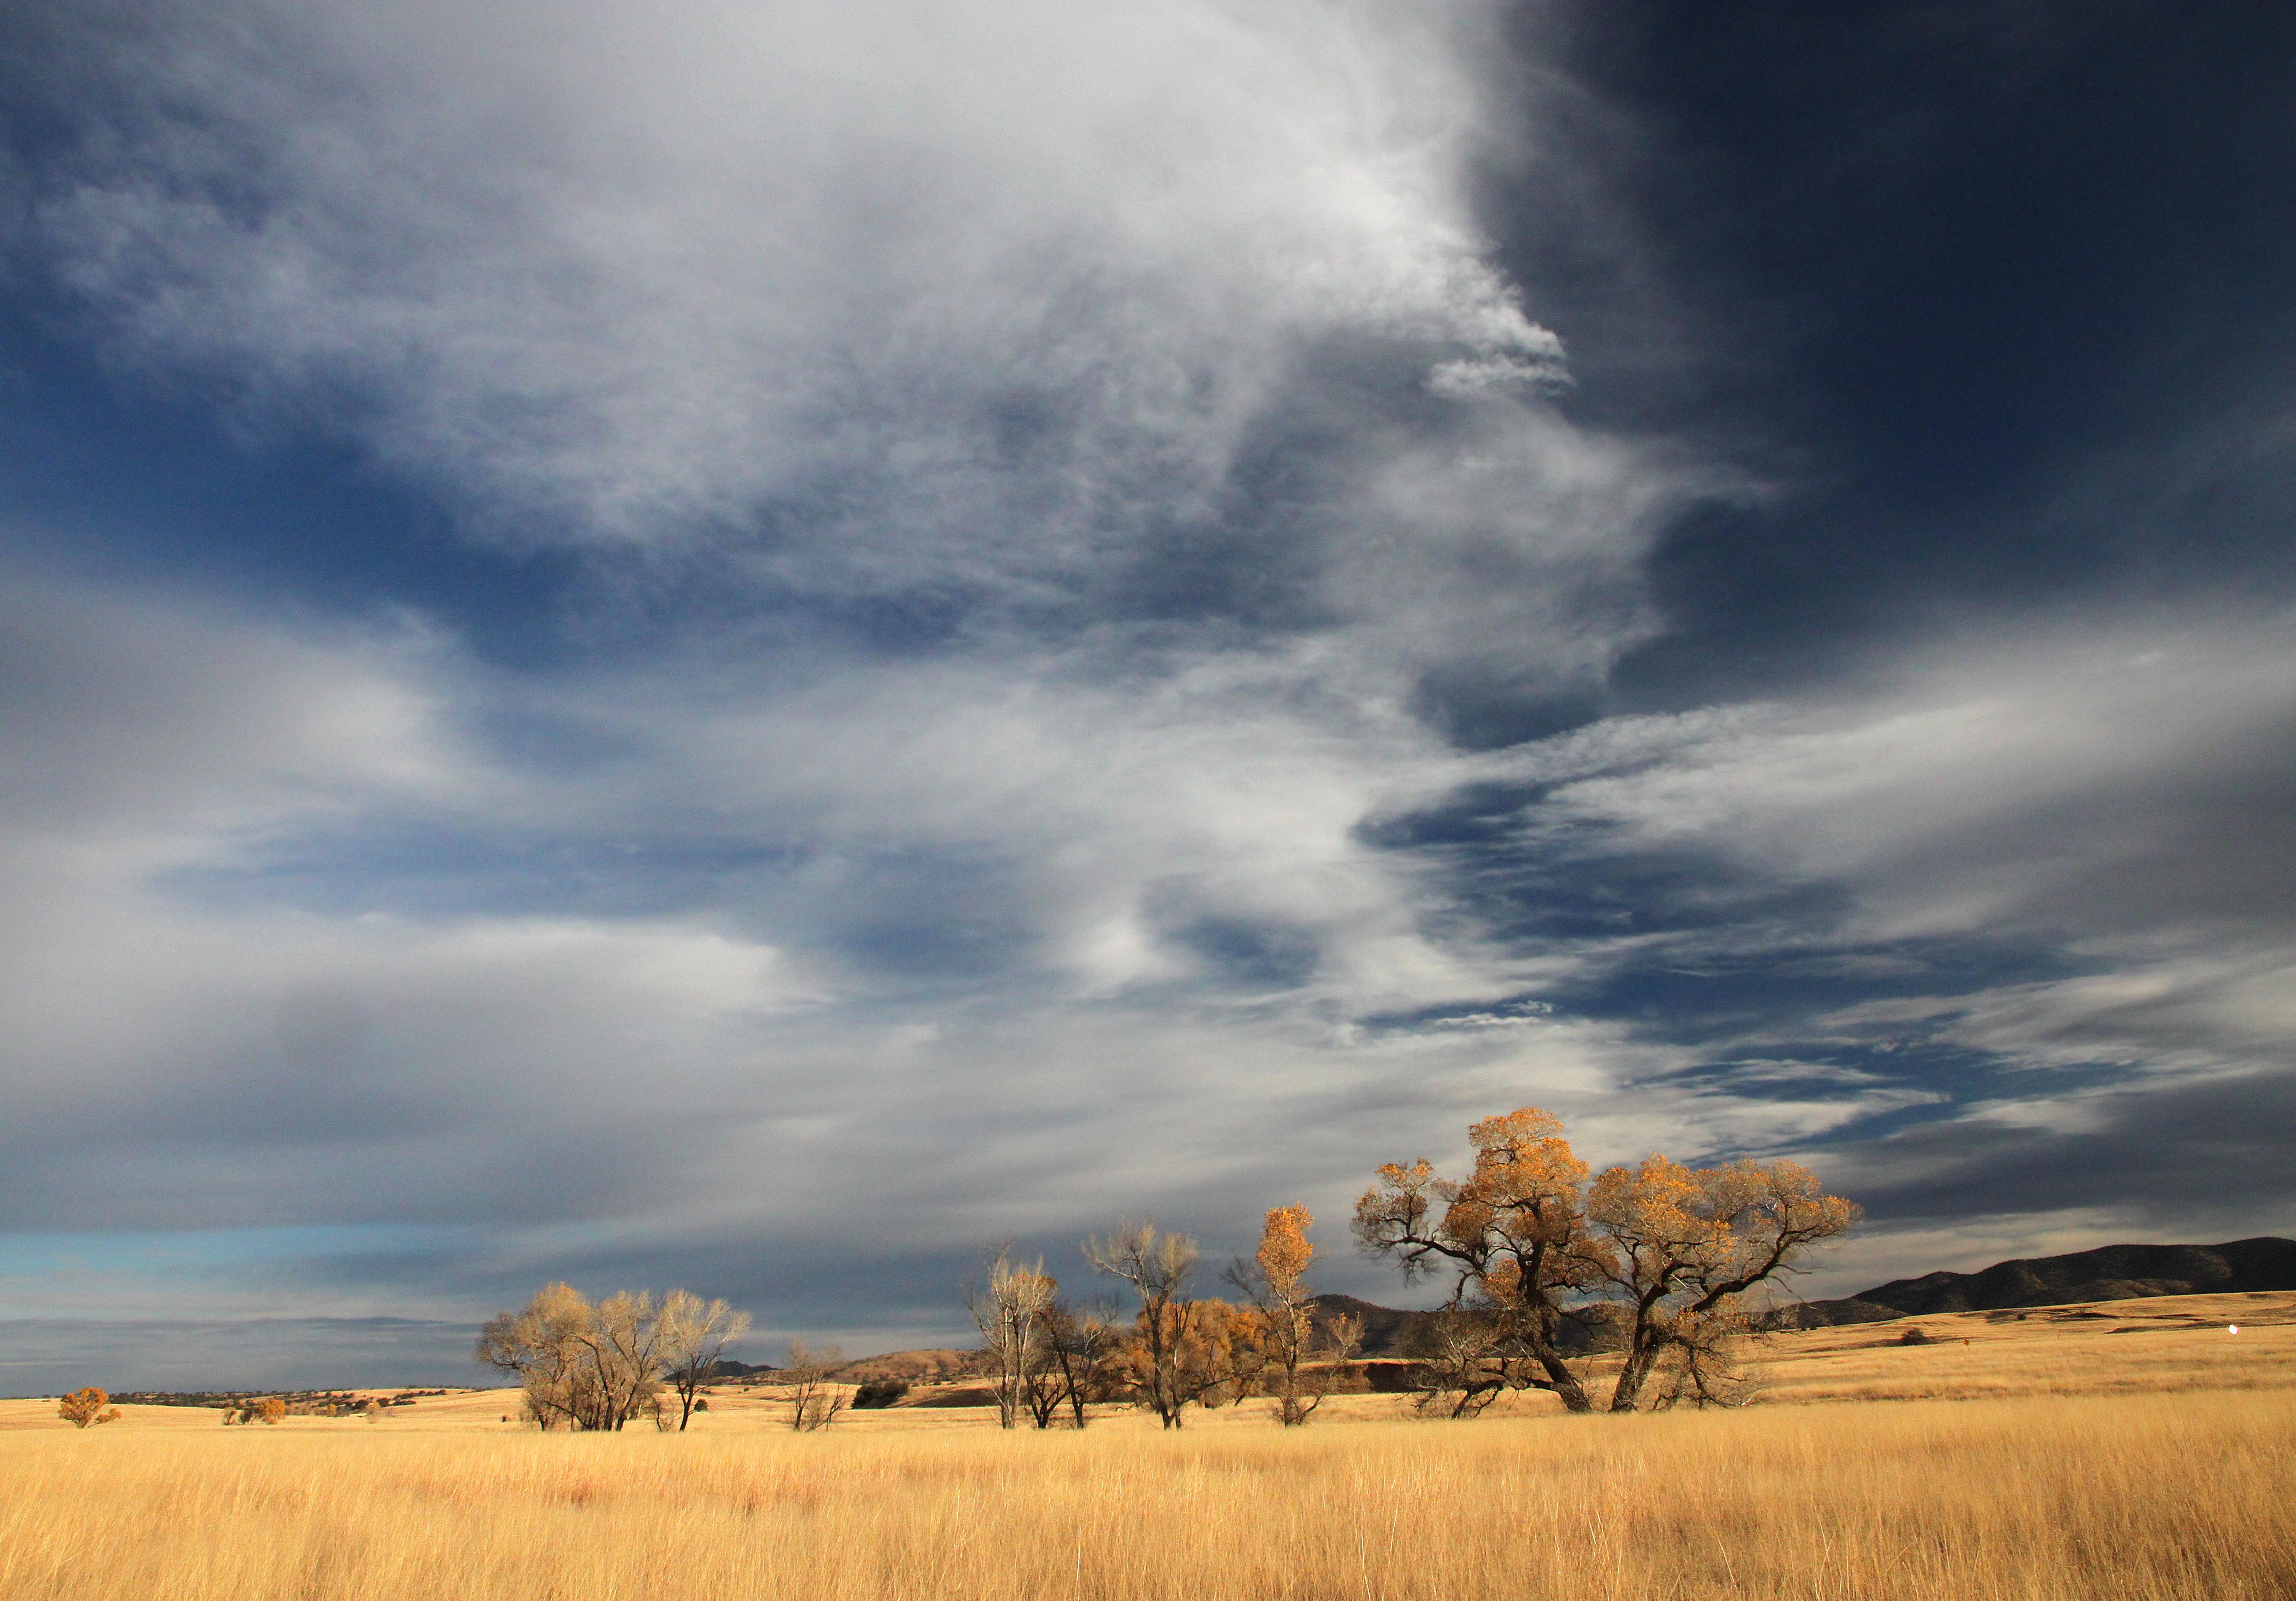 San rafael valley grasslands, se of patagonia, scc, az (11-24-11) -01 photo